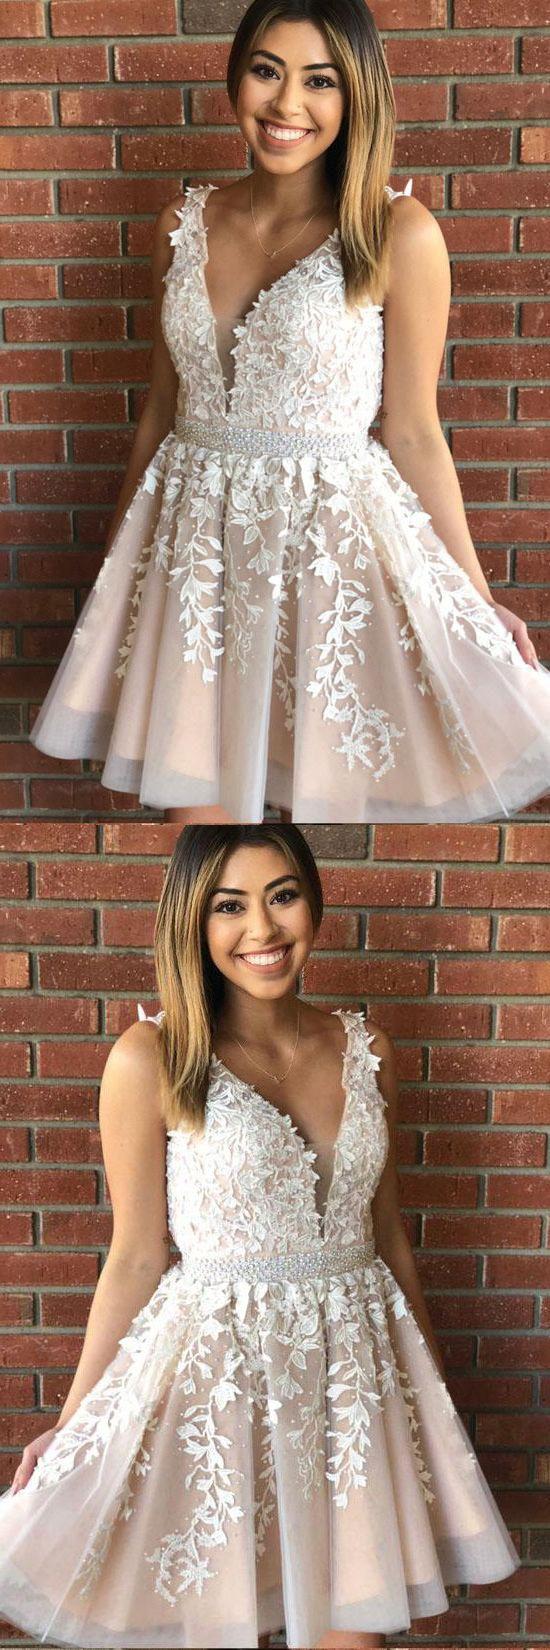 Princess V Neck Short A Line Lace Homecoming DressGraduation